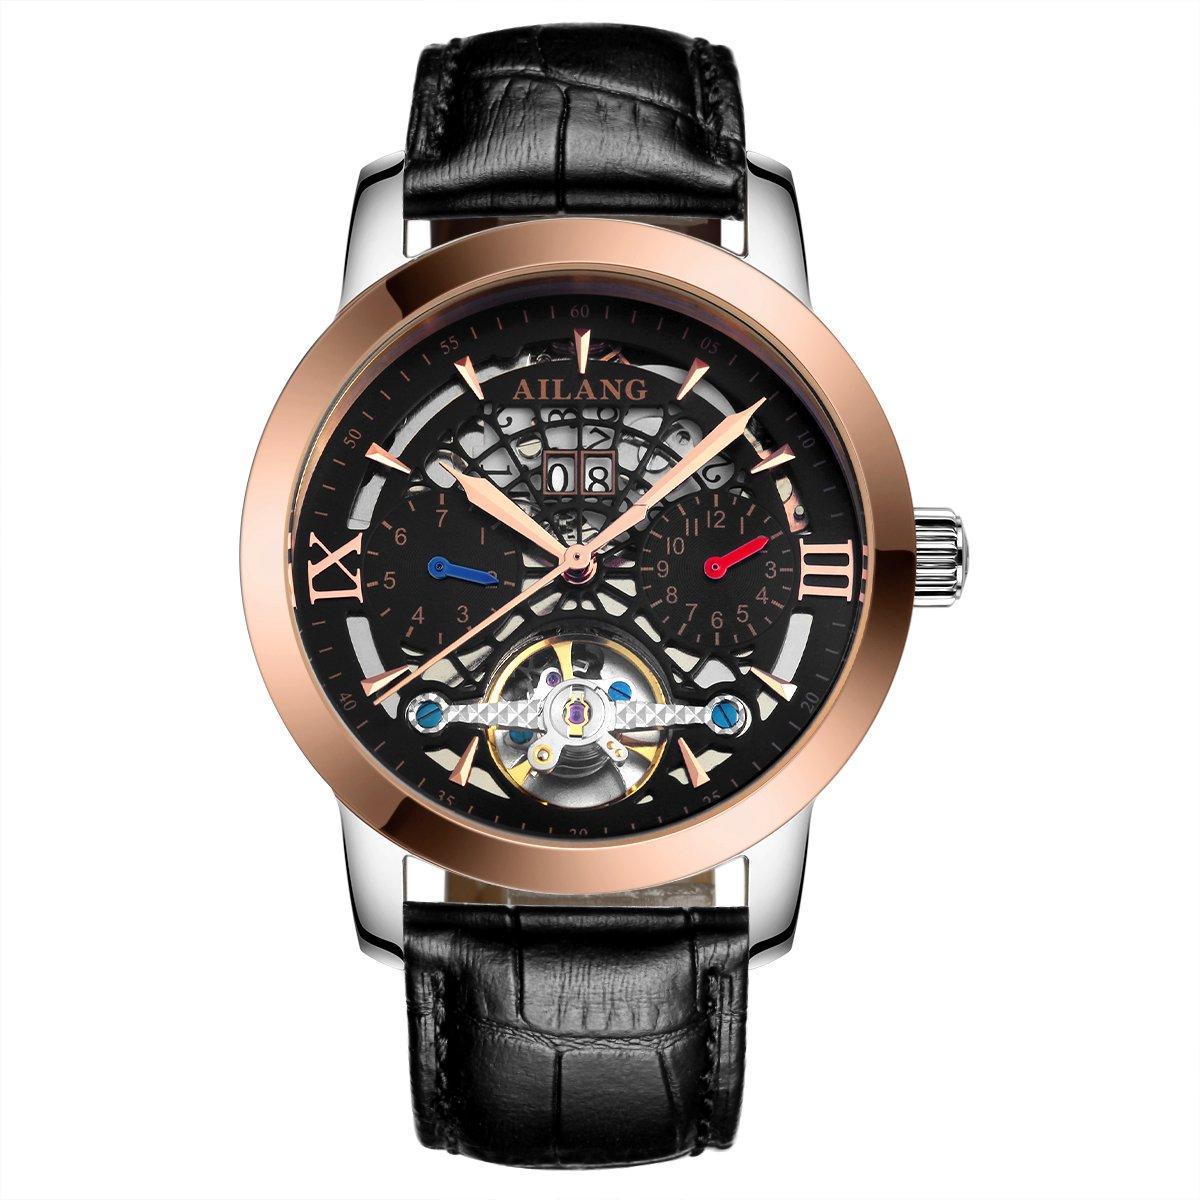 ailang 2606lkメンズ自動巻き自動機械スケルトンレザー腕時計 ブラック/ゴールド B071NQMJXG ブラック/ゴールド ブラック/ゴールド